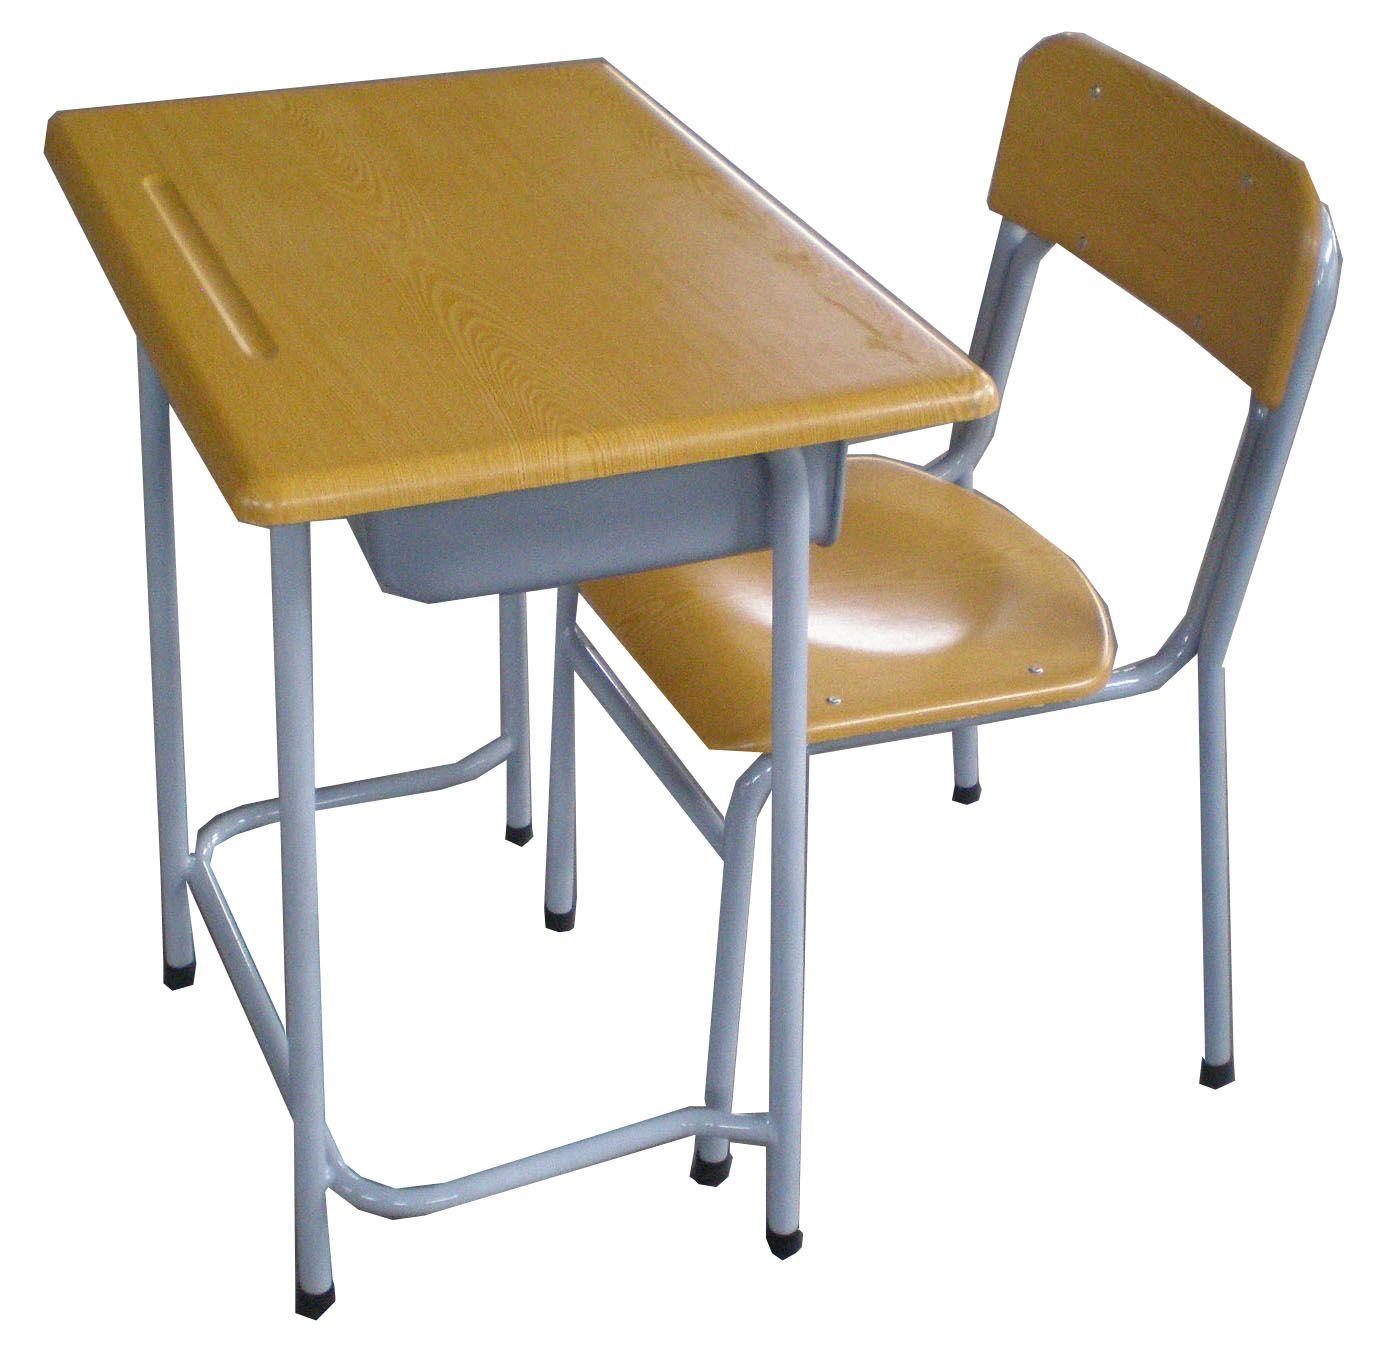 School Desk Clipart-School Desk Clipart-14